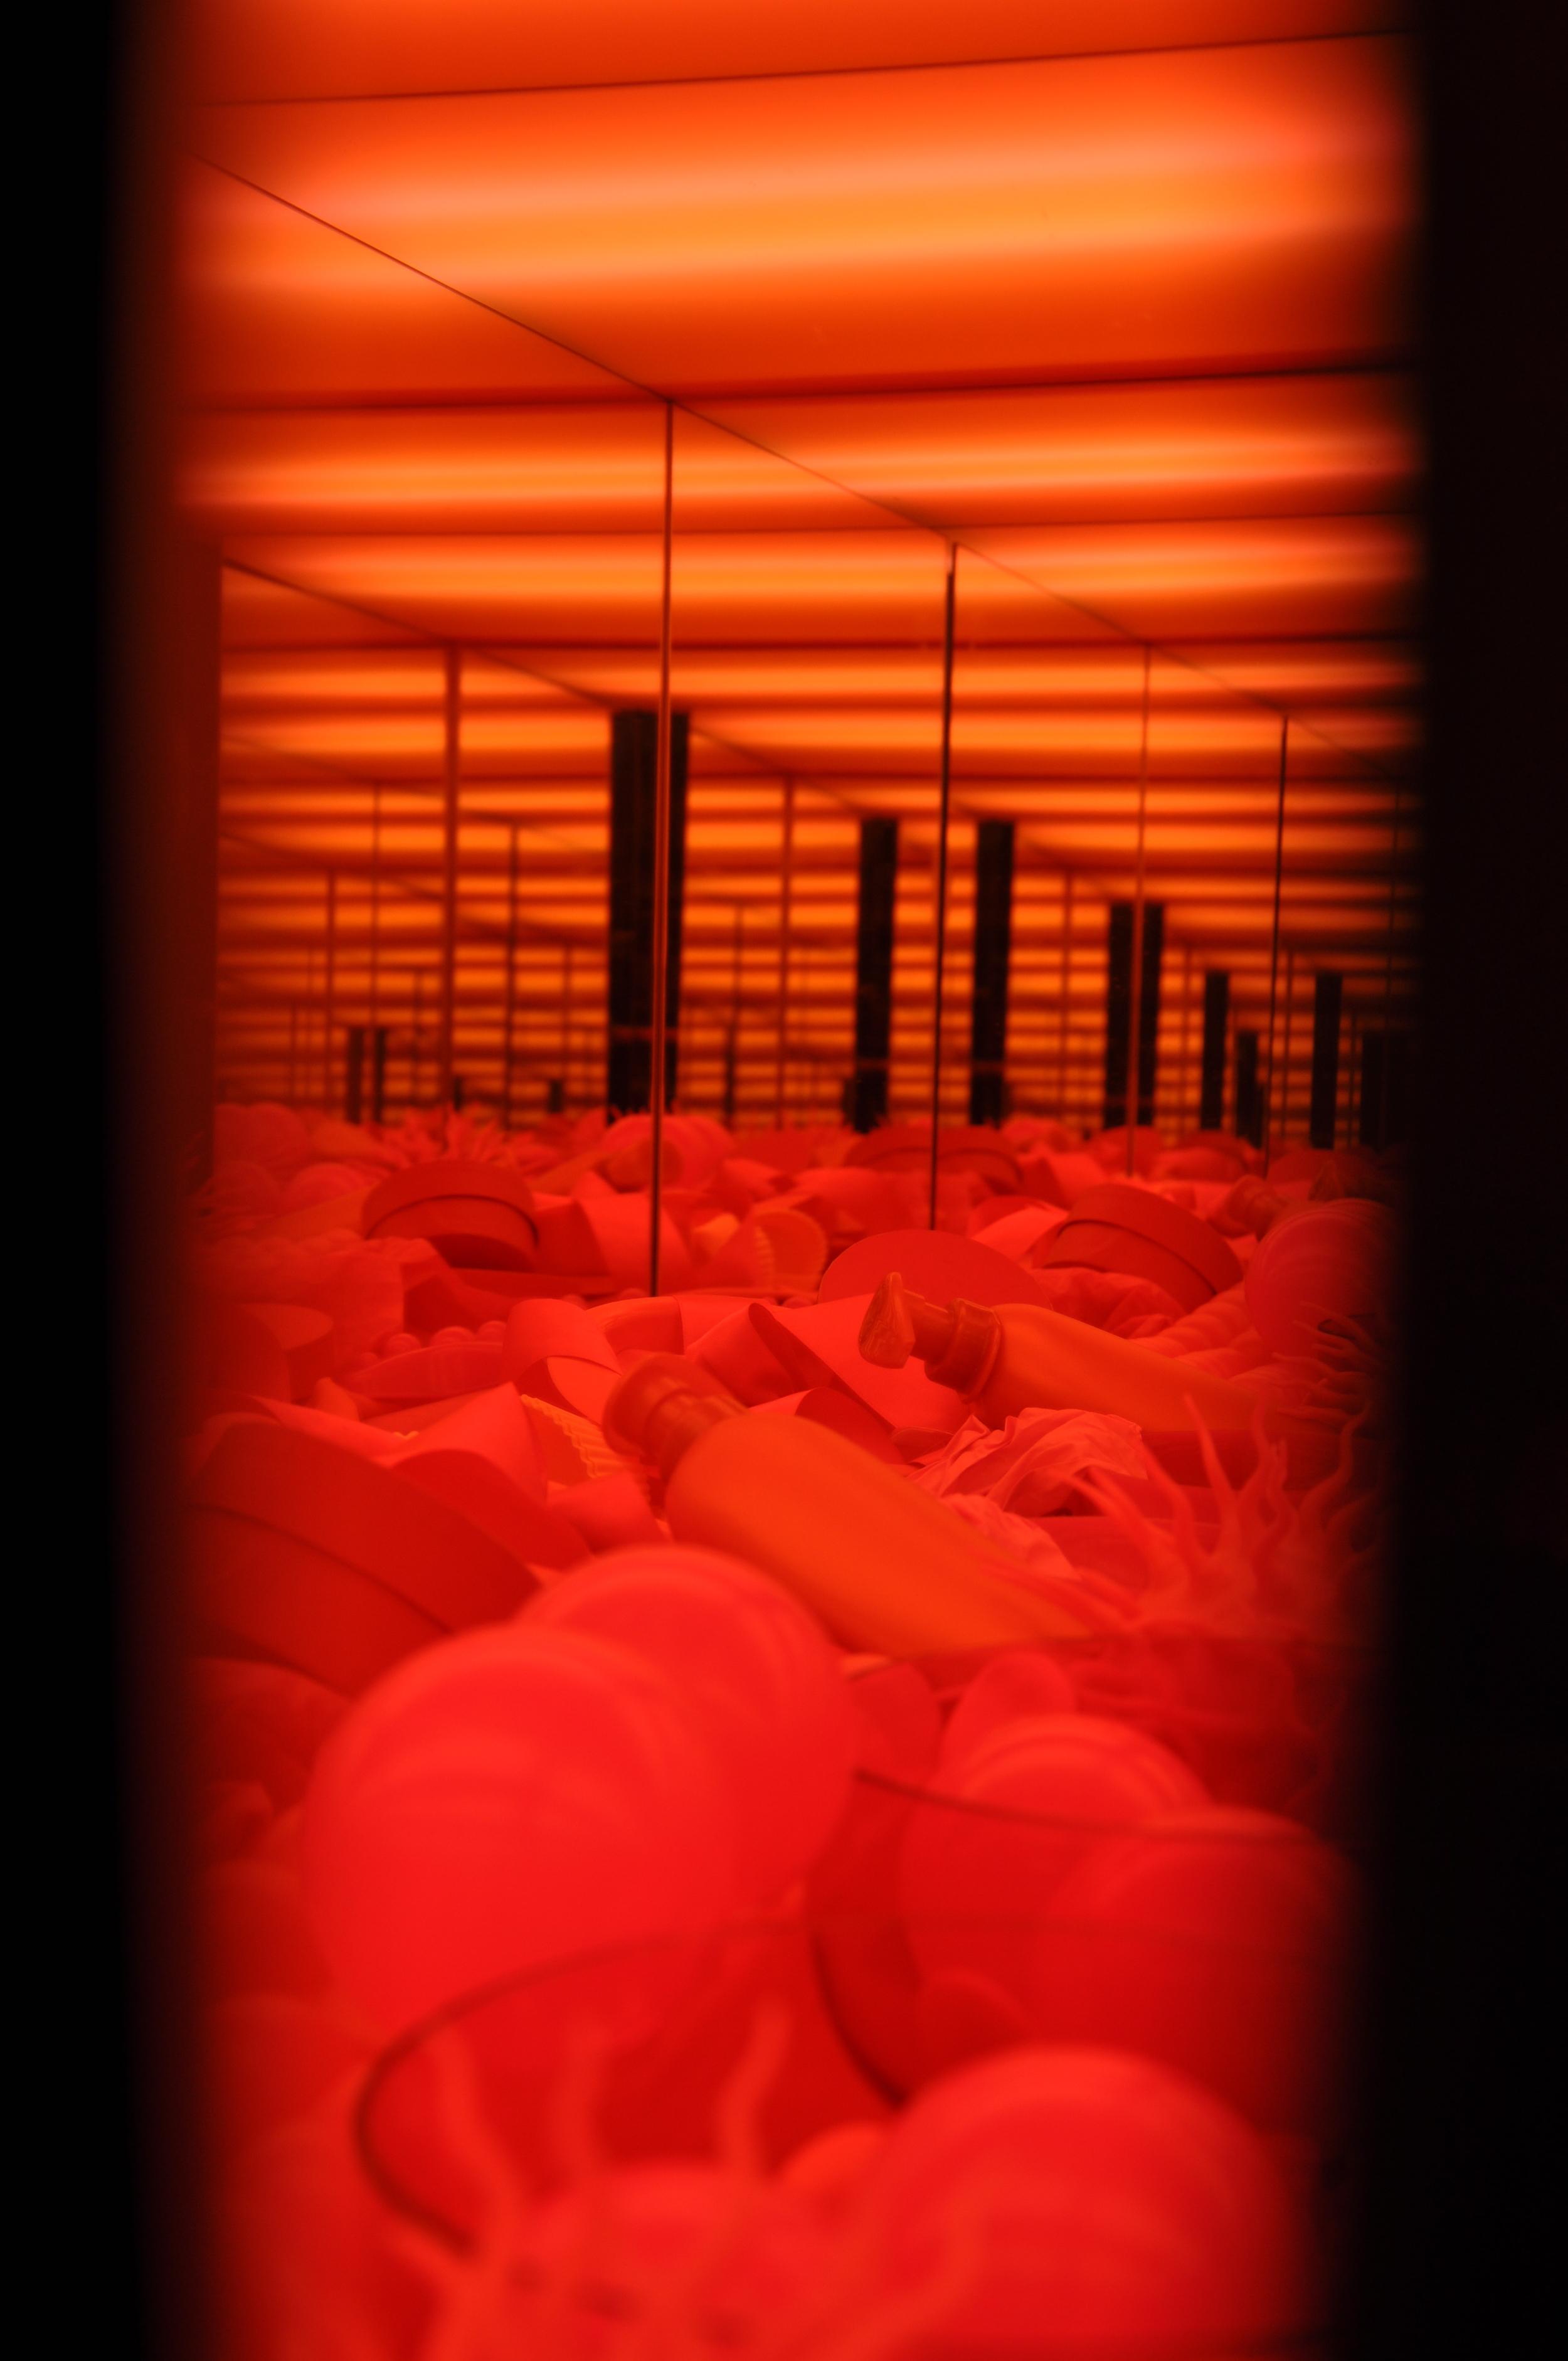 7. Red Chamber (Internal View), Mixed Media Installation, 2011 -2.jpg